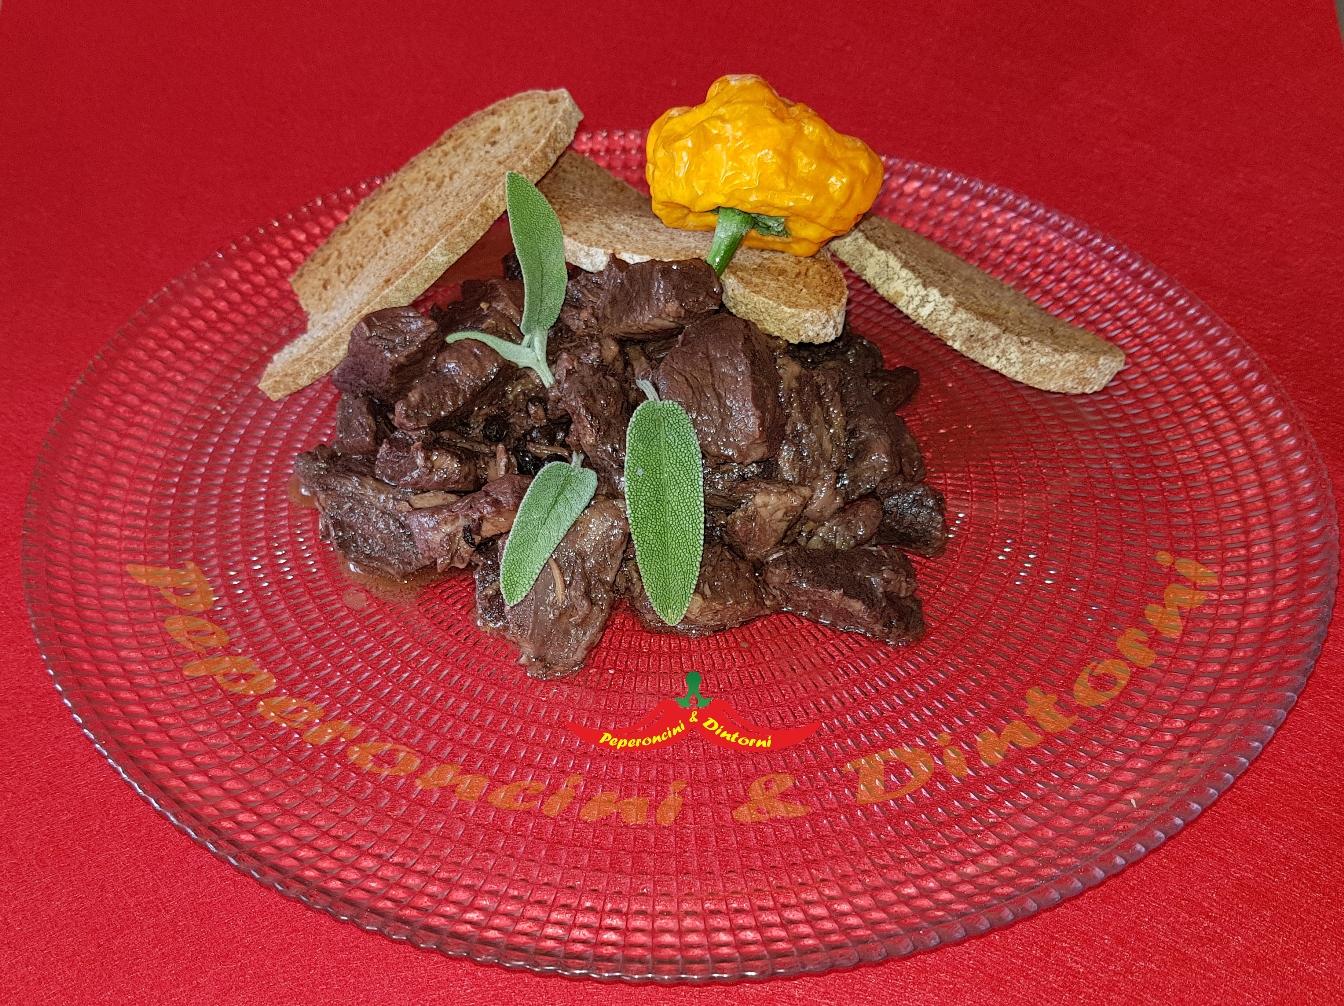 Peposo dell'impruneta con Jamaican mushroom